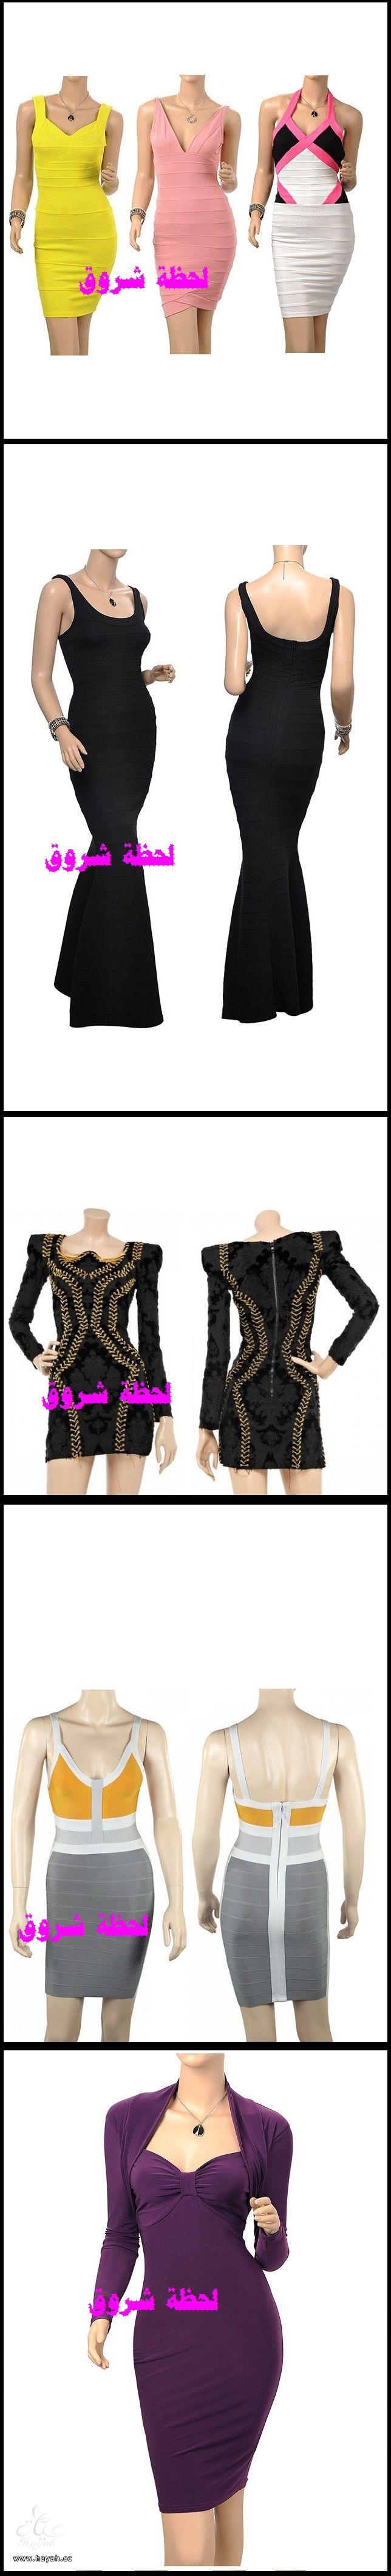 Dresses2015  2 hayahcc_1435965286_366.jpg